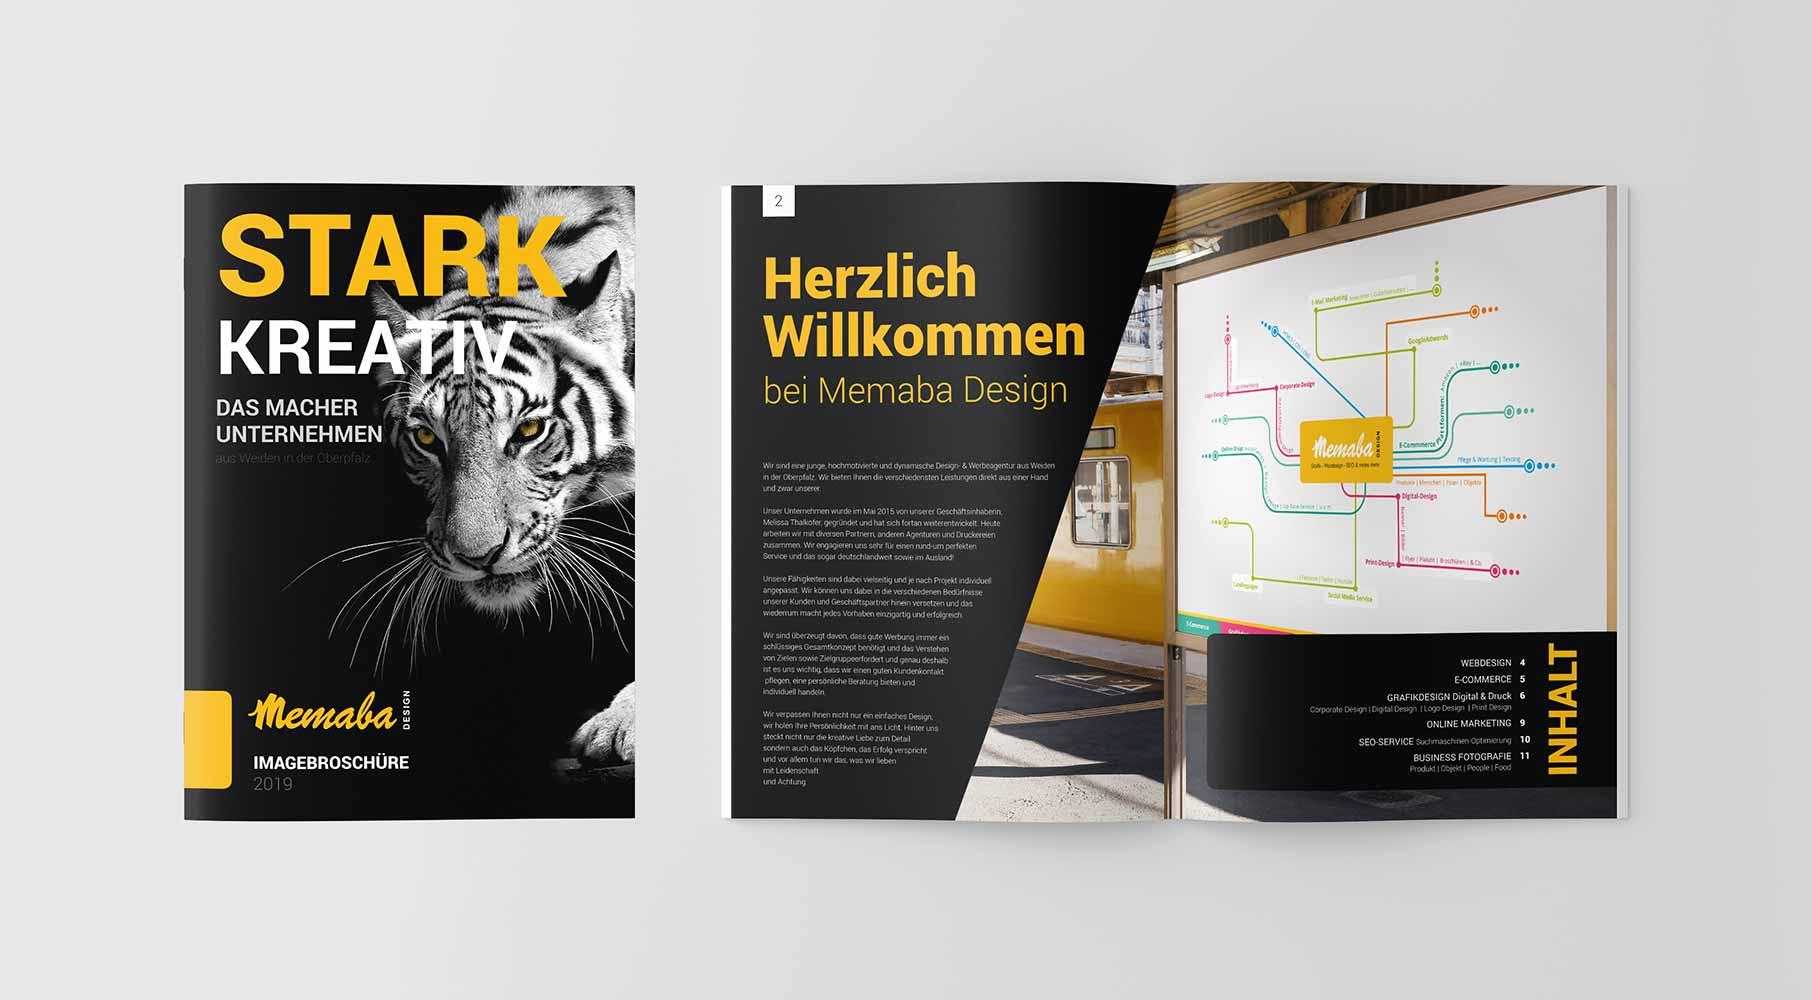 Memaba-Design-Image-Broschuere-2019